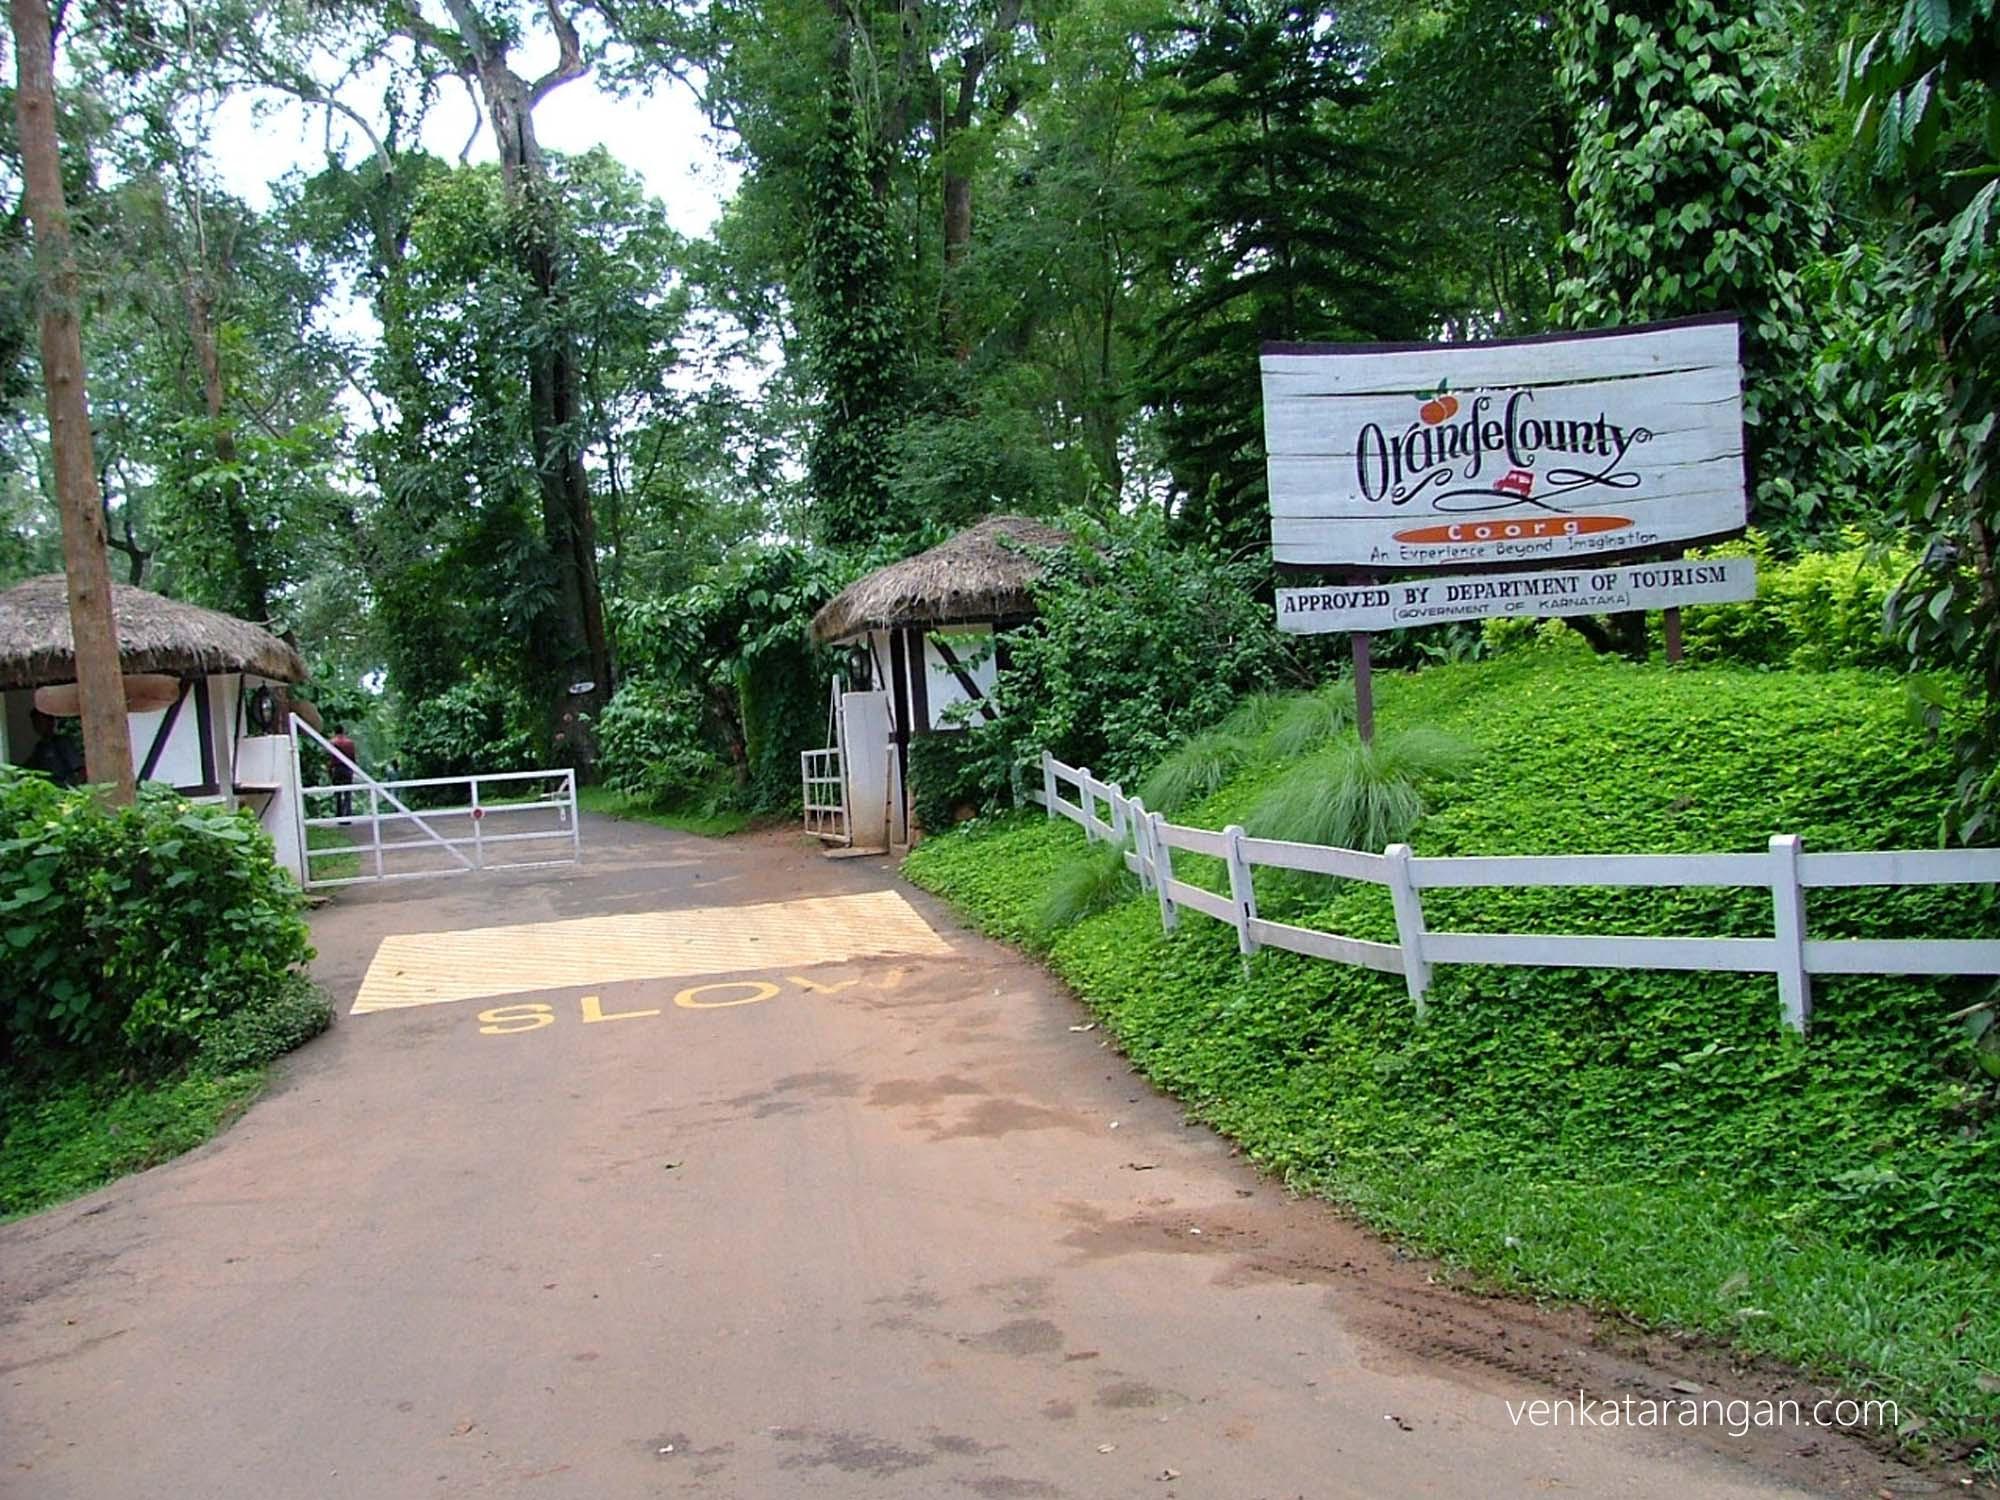 Orange Country resort, Coorg, Karnataka